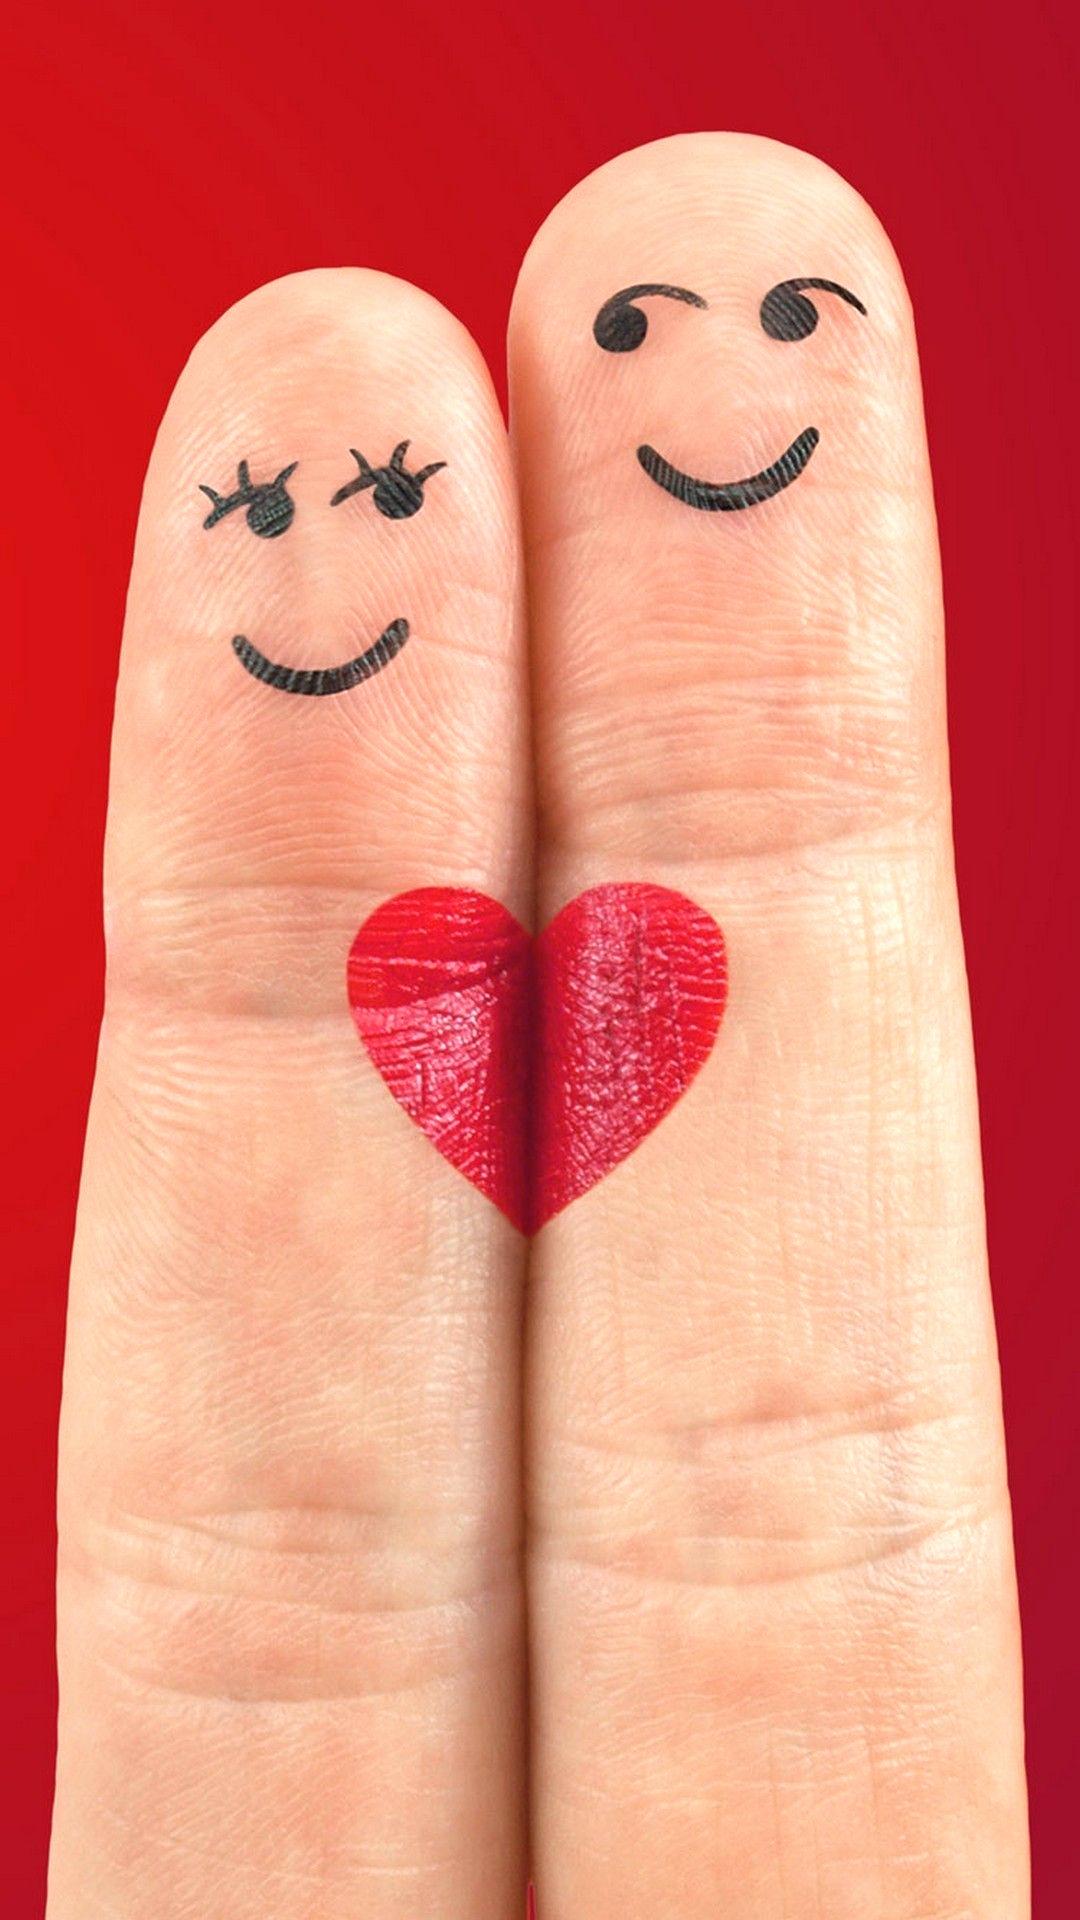 Finger Couple Love Heart - HD Wallpaper